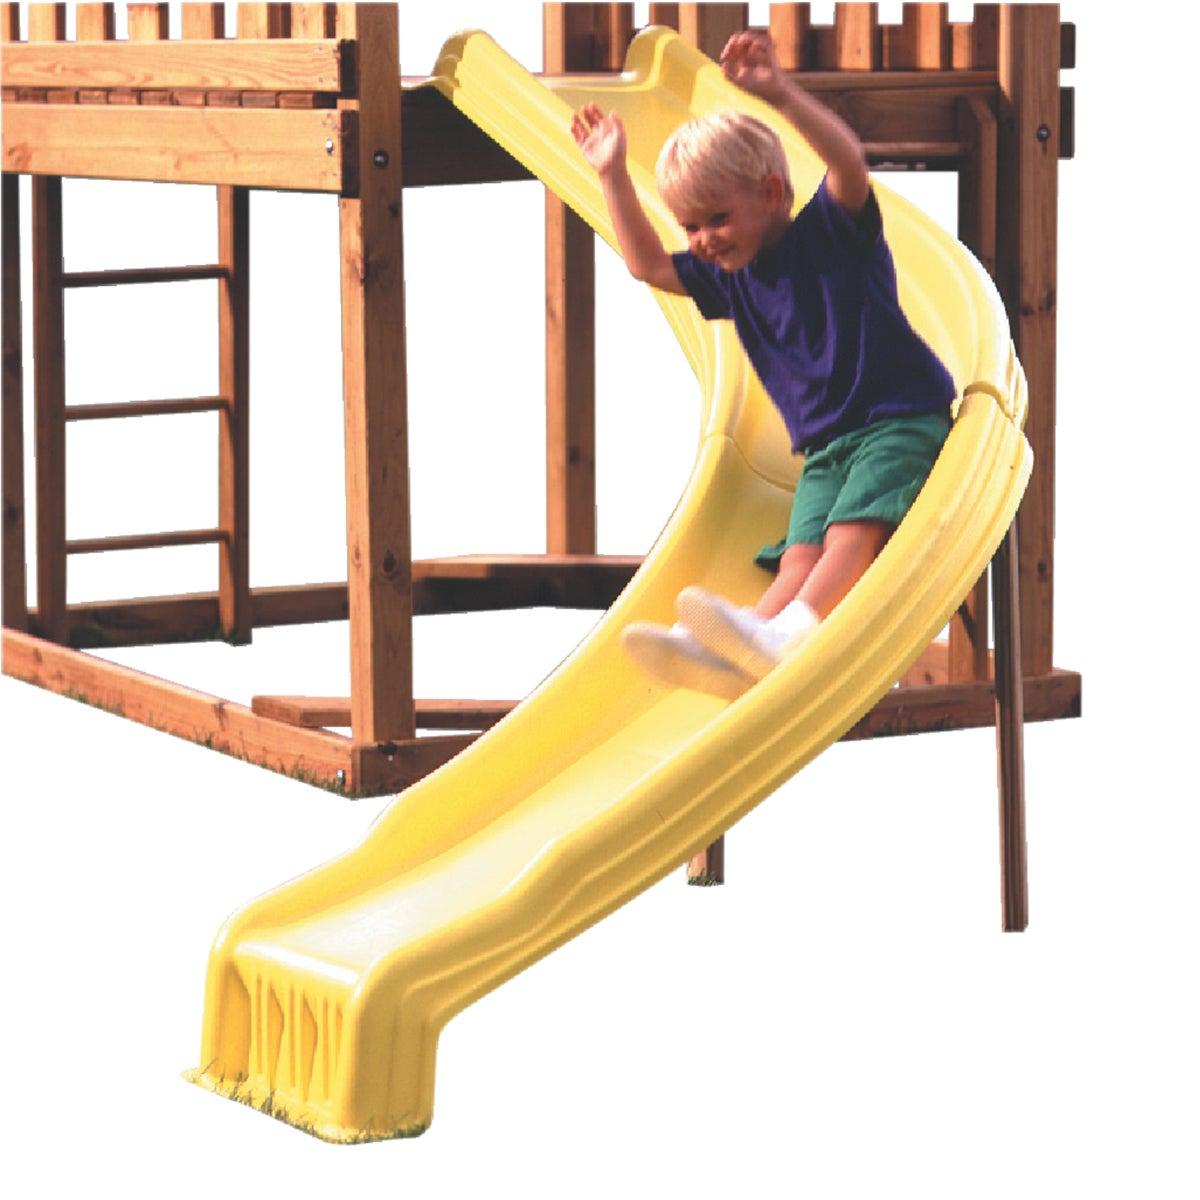 Swing N Slide YELLOW SIDE WINDER SLIDE NE4678-1YB